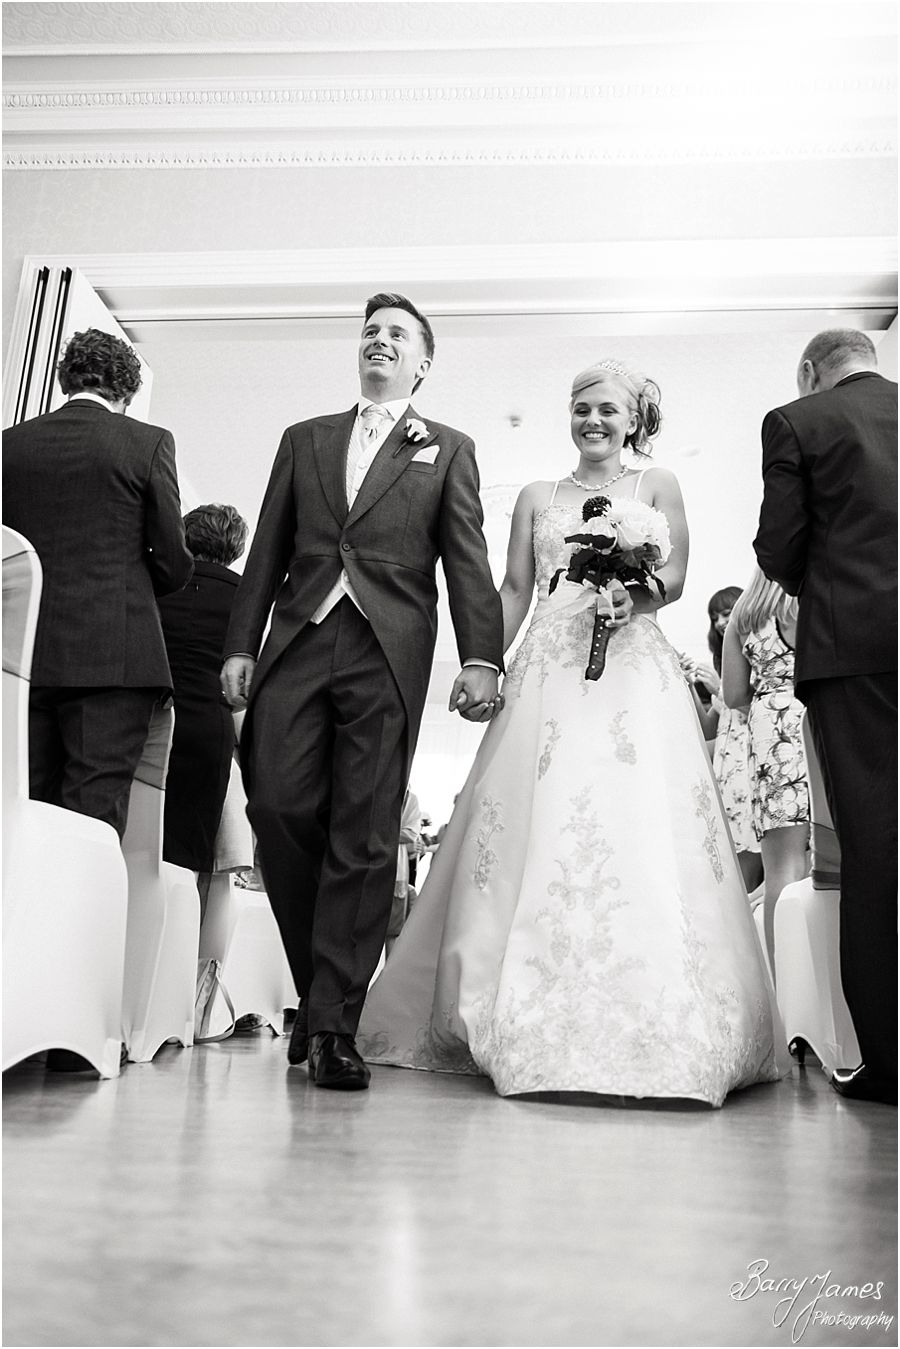 Capturing the wedding story in emotive, beautiful photos at Rodbaston Hall in Penkridge by Penkridge Wedding Photographer Barry James